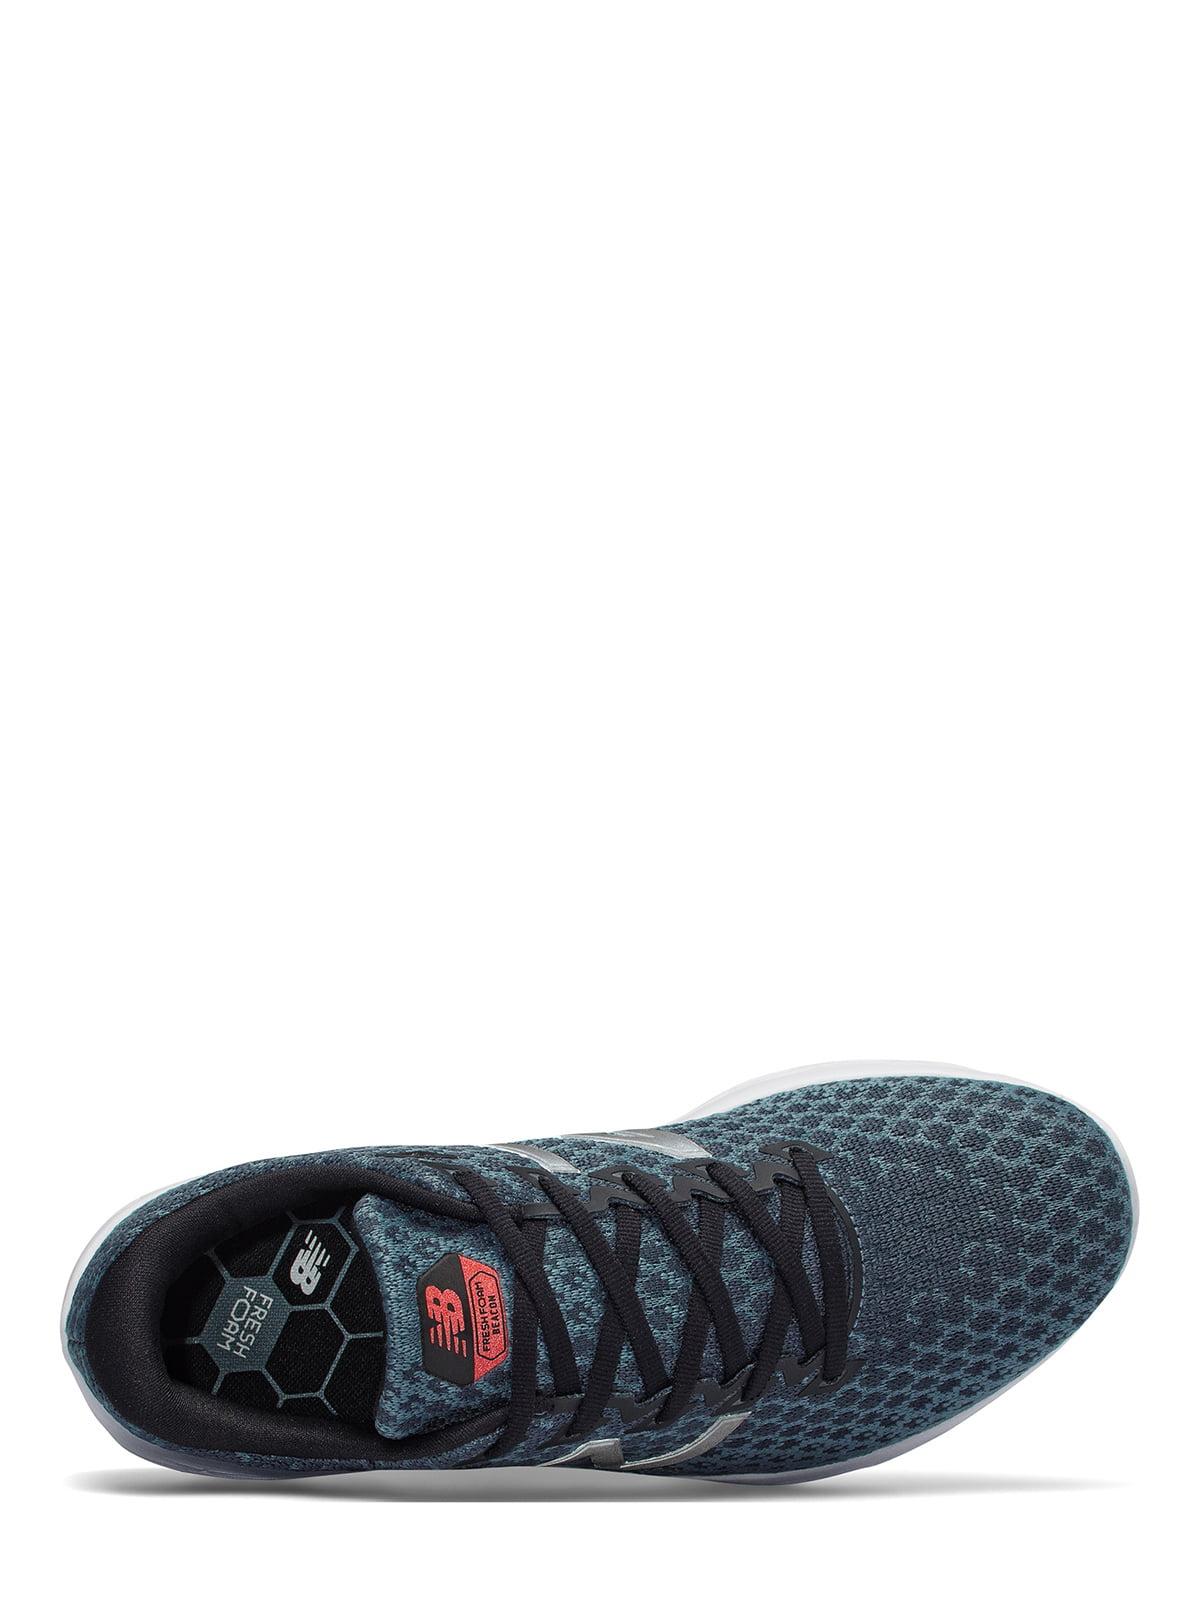 Кросівки сіро-сині Fresh Foam Beacon | 4579051 | фото 3